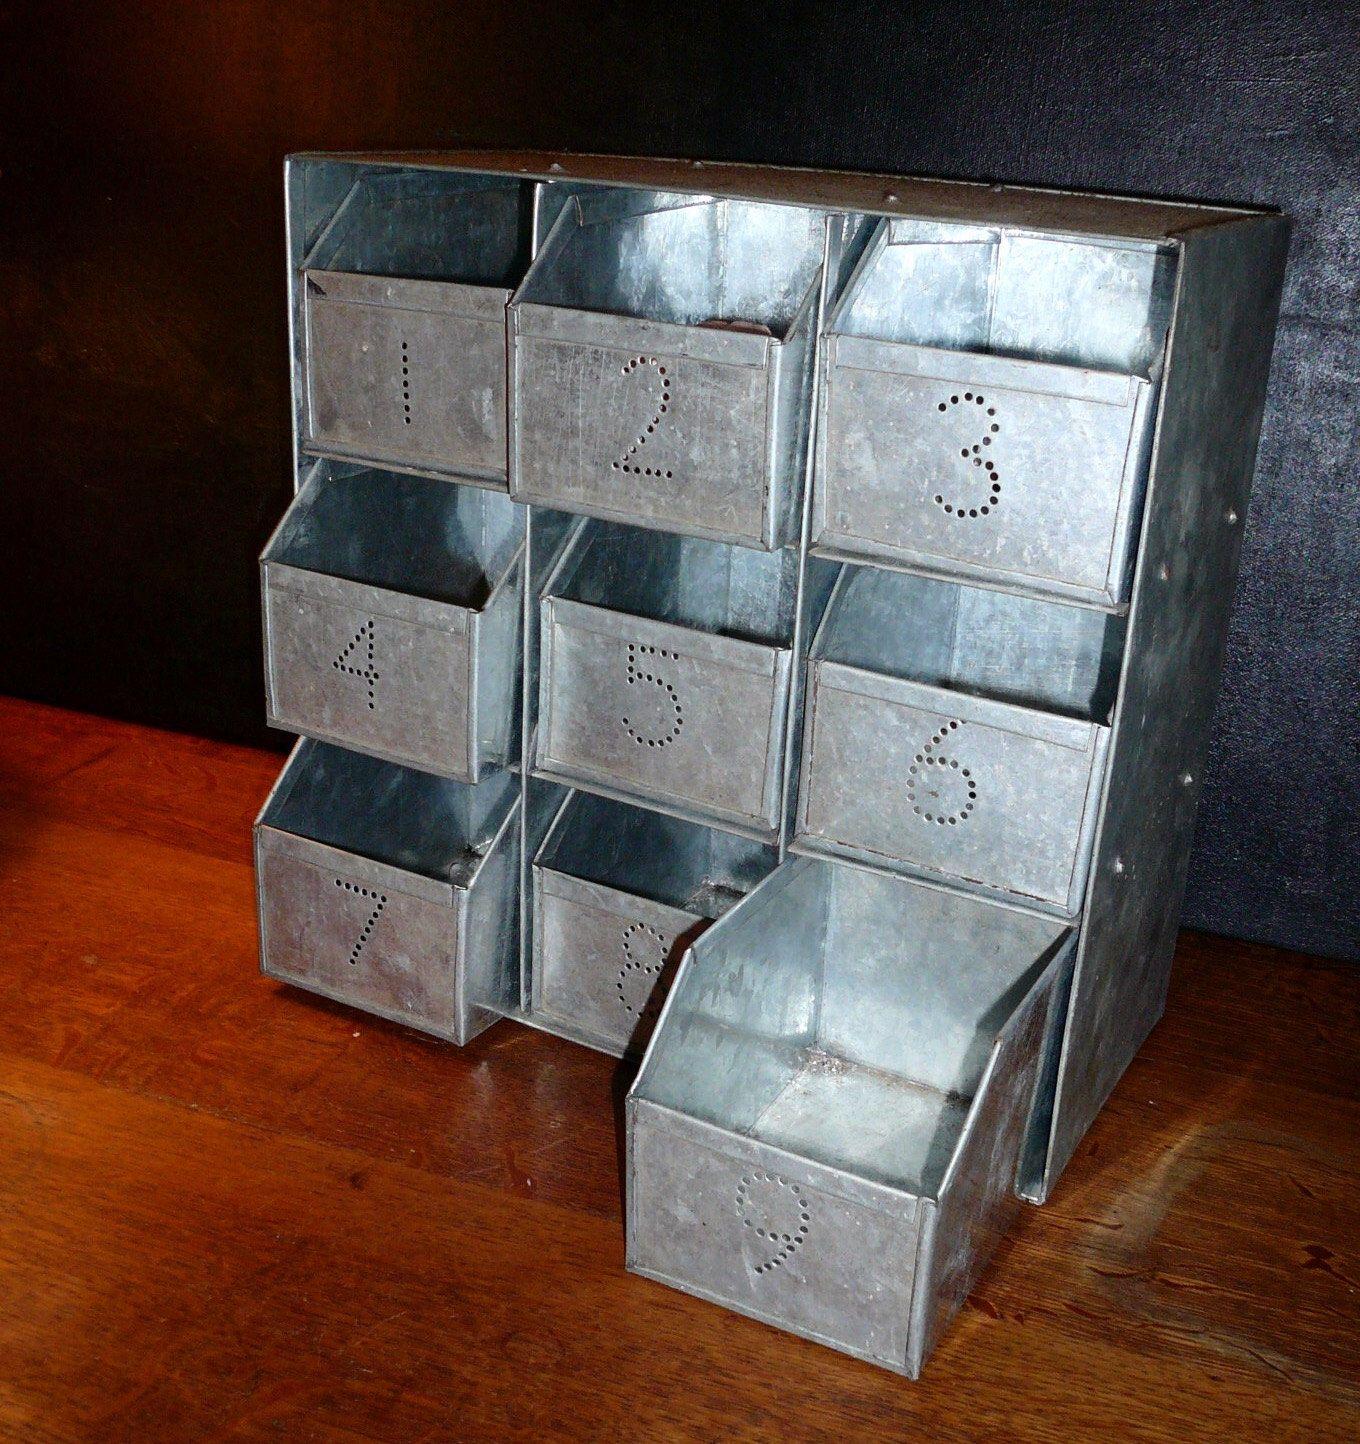 Metal Cabinet Bin Industrial Storage Industrial Cabinet Metal Parts Bin  Storage Bin Metal Box Industrial Decor Home Decor Parts Cabinet By  VintageReinvented ...